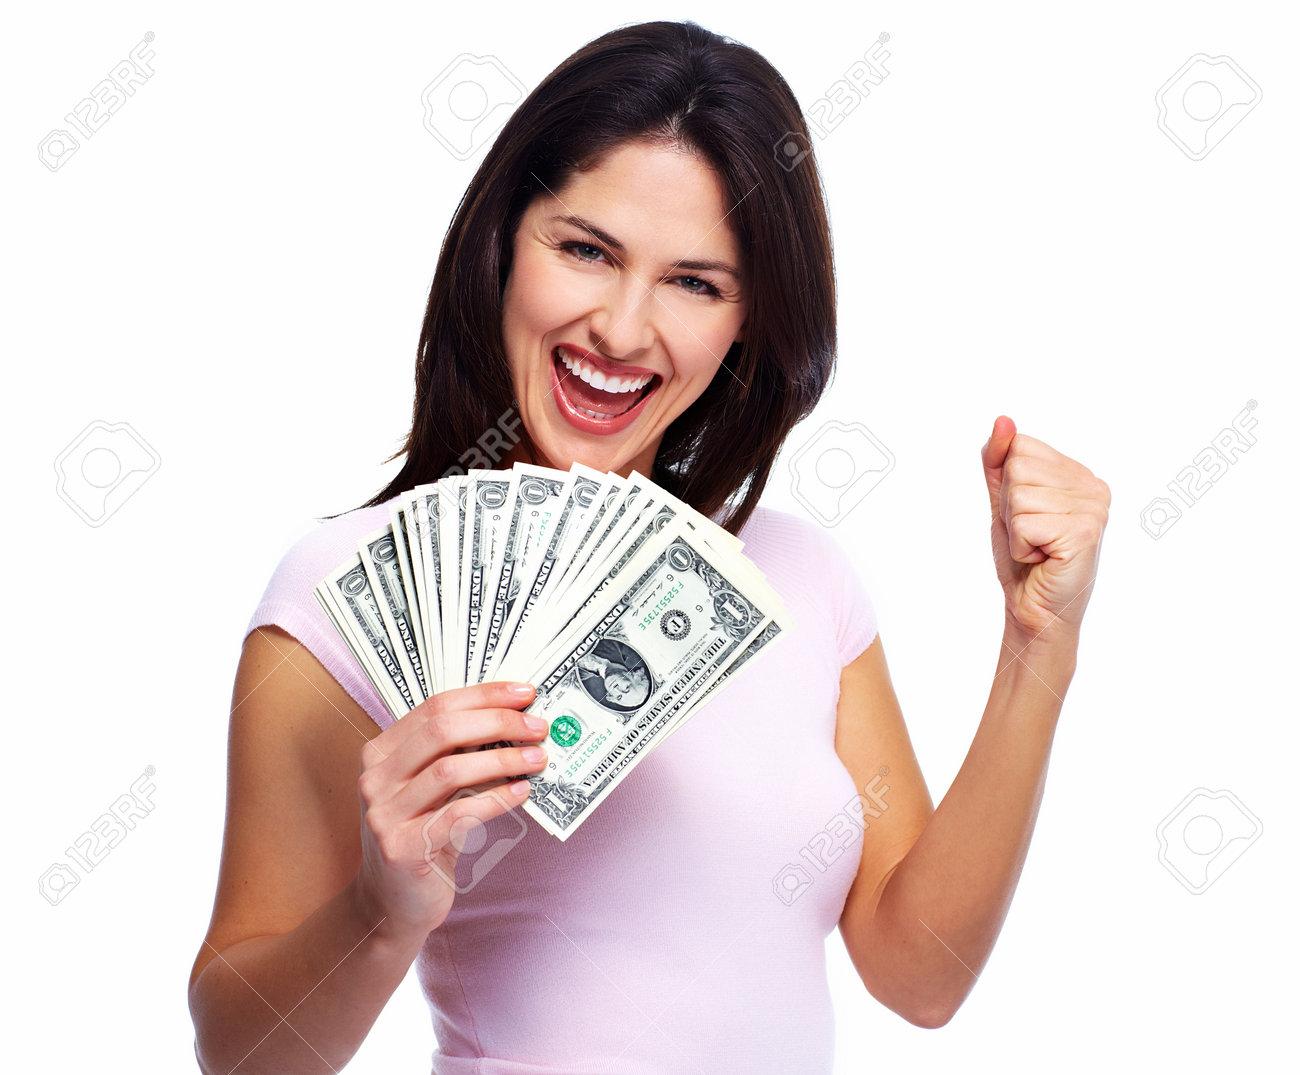 معدل دخل هذه الأبراج سيتضاعف في الـ 2019! 22724354-happy-young-smiling-woman-holding-cash-isolated-over-white-background